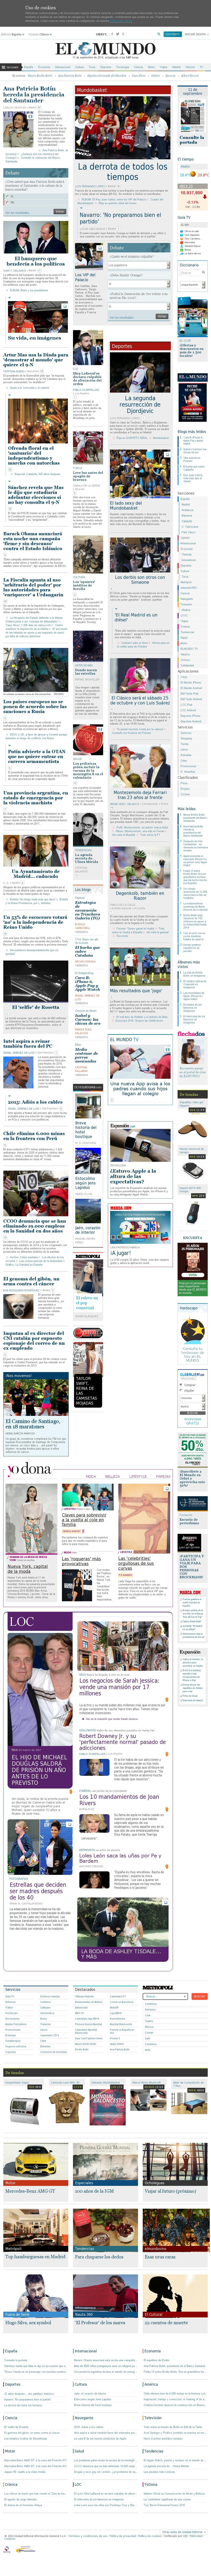 El Mundo at Wednesday Sept. 10, 2014, 11:18 p.m. UTC